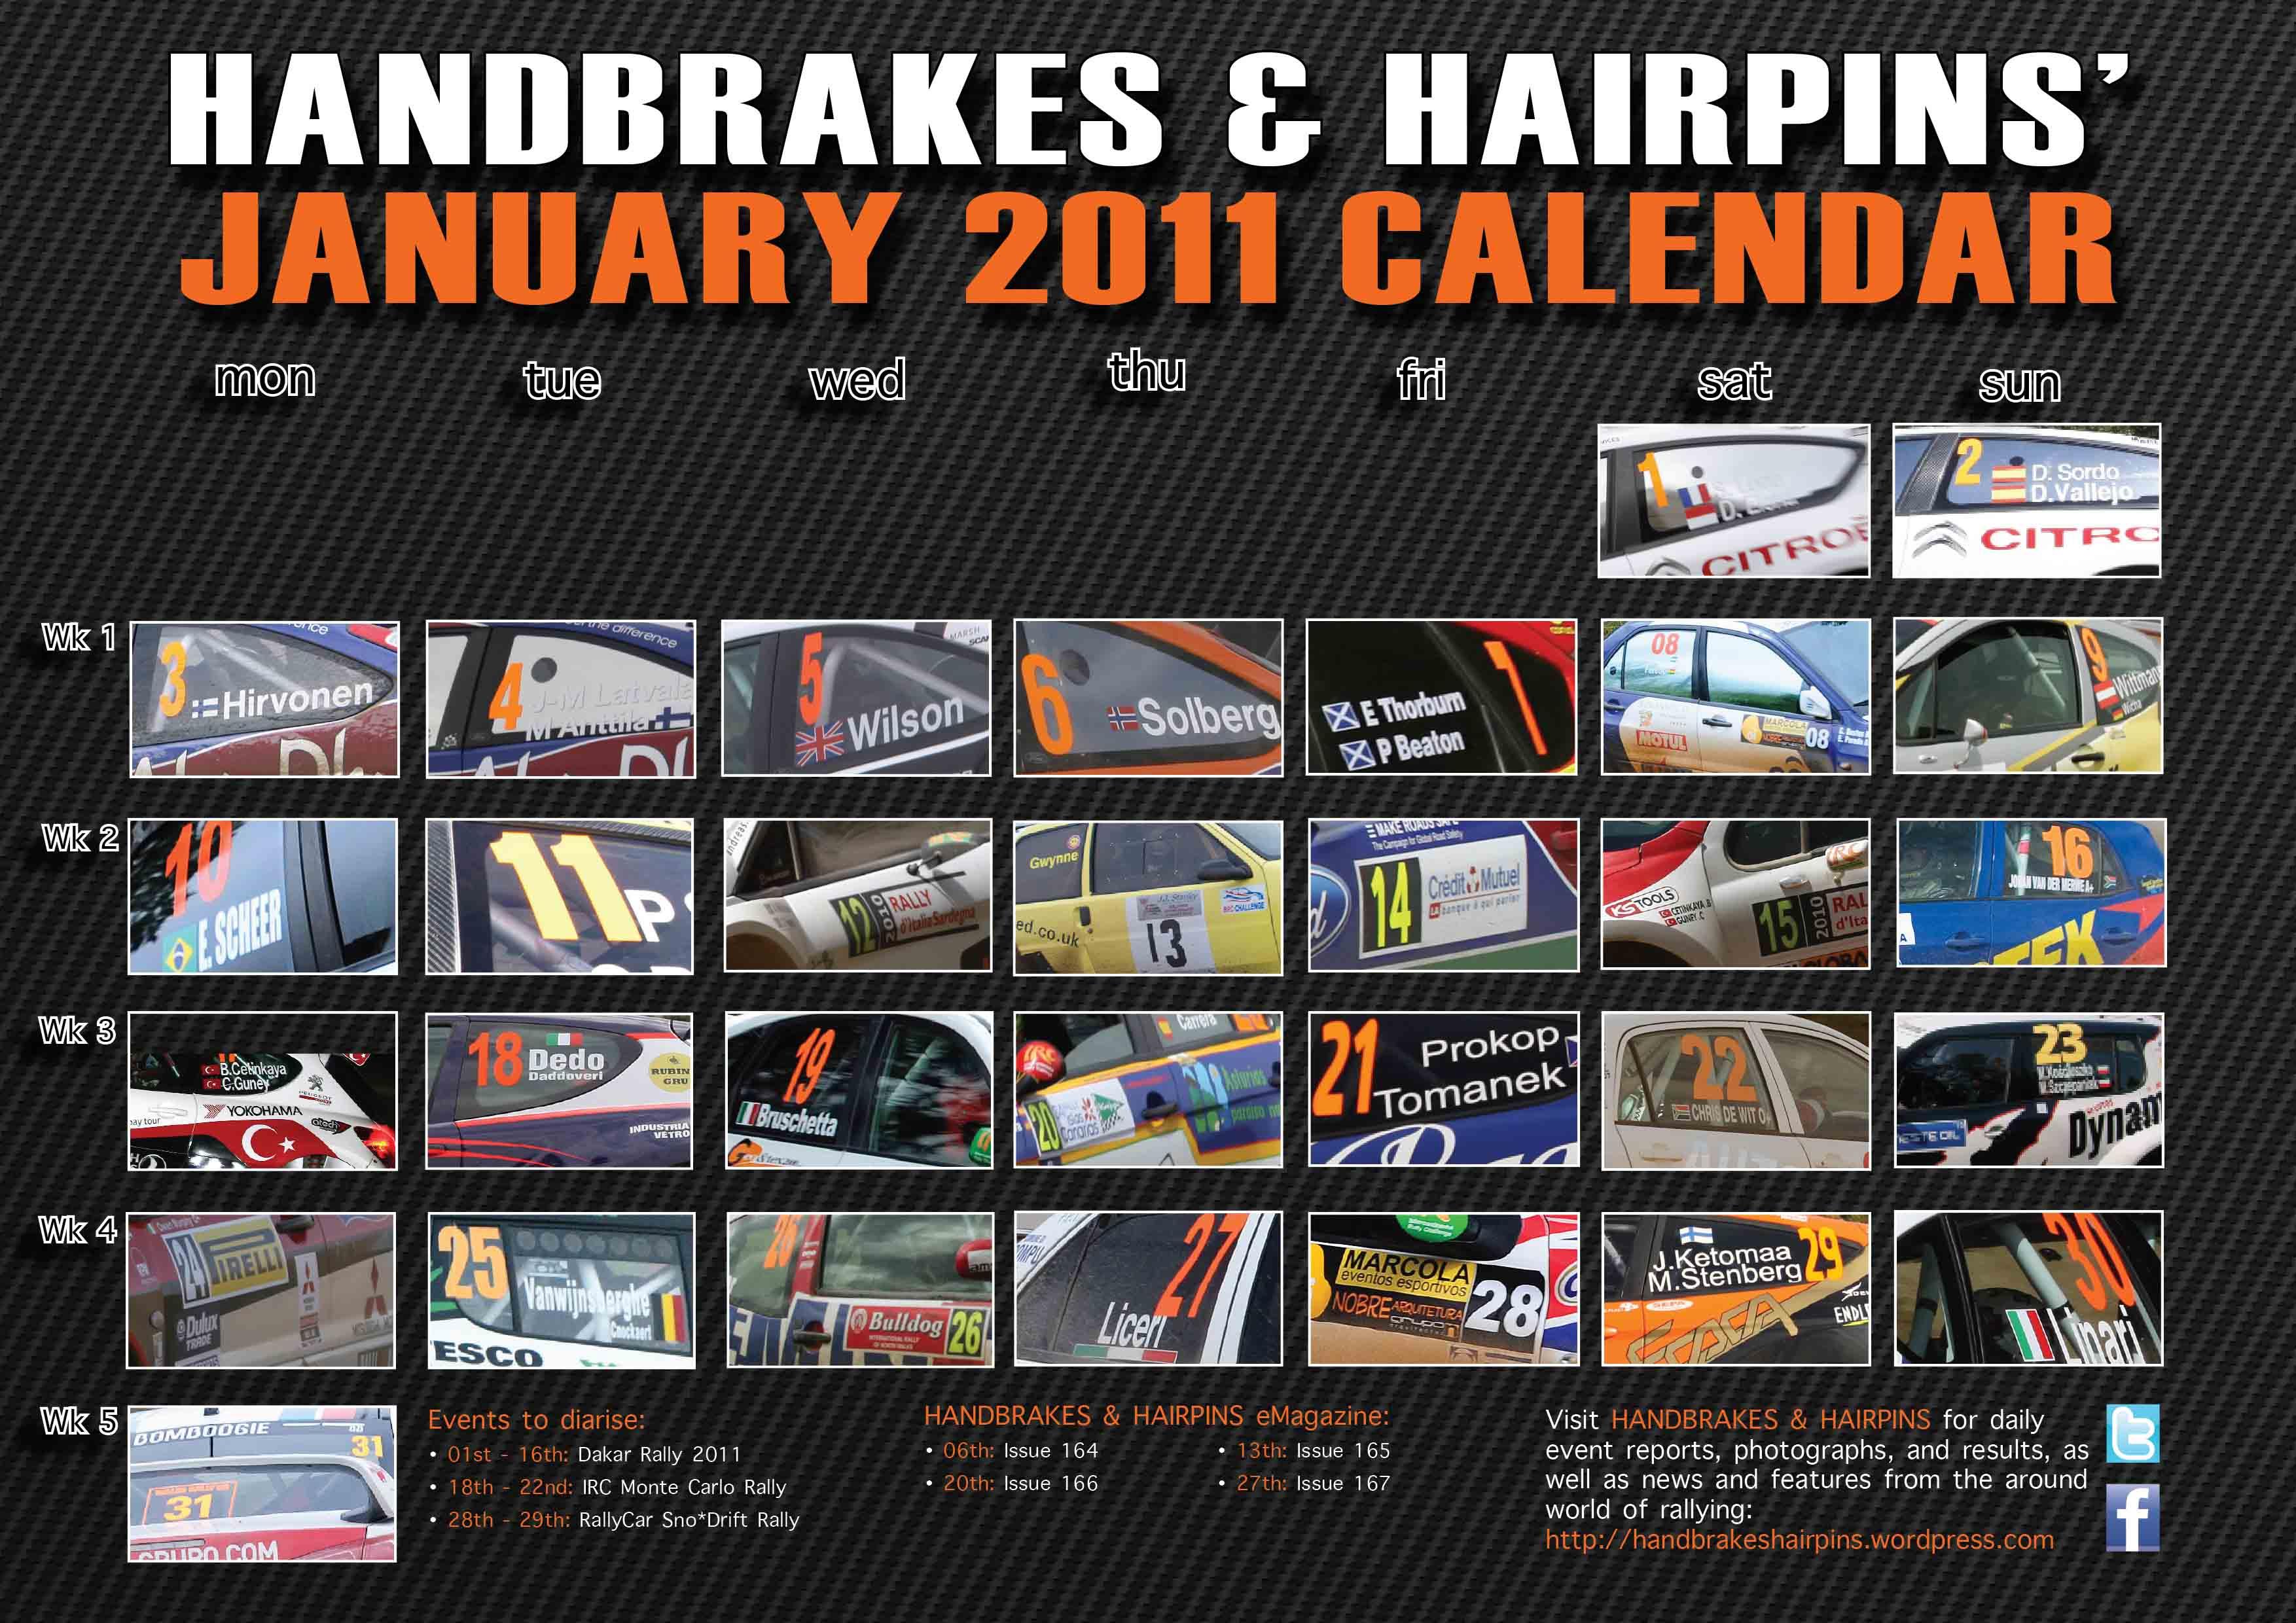 2011 calendar january. calendar-january-2011.pdf: